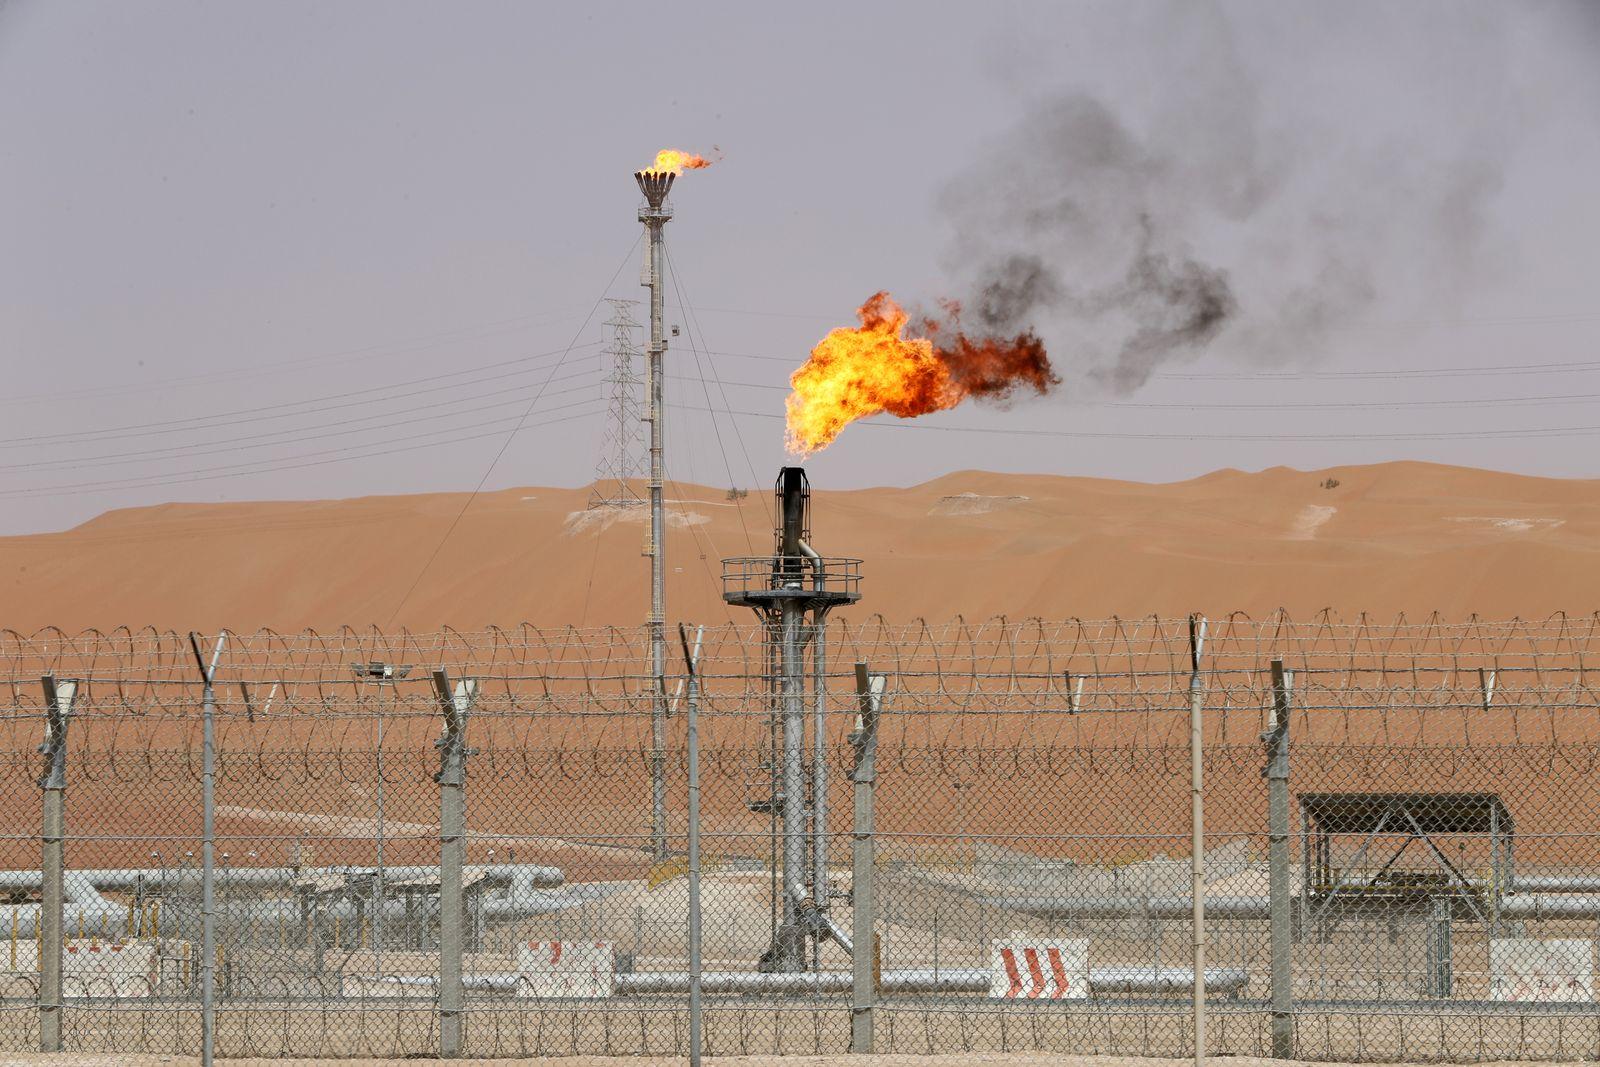 Vorrat/ Saudi Arabien/ Öl